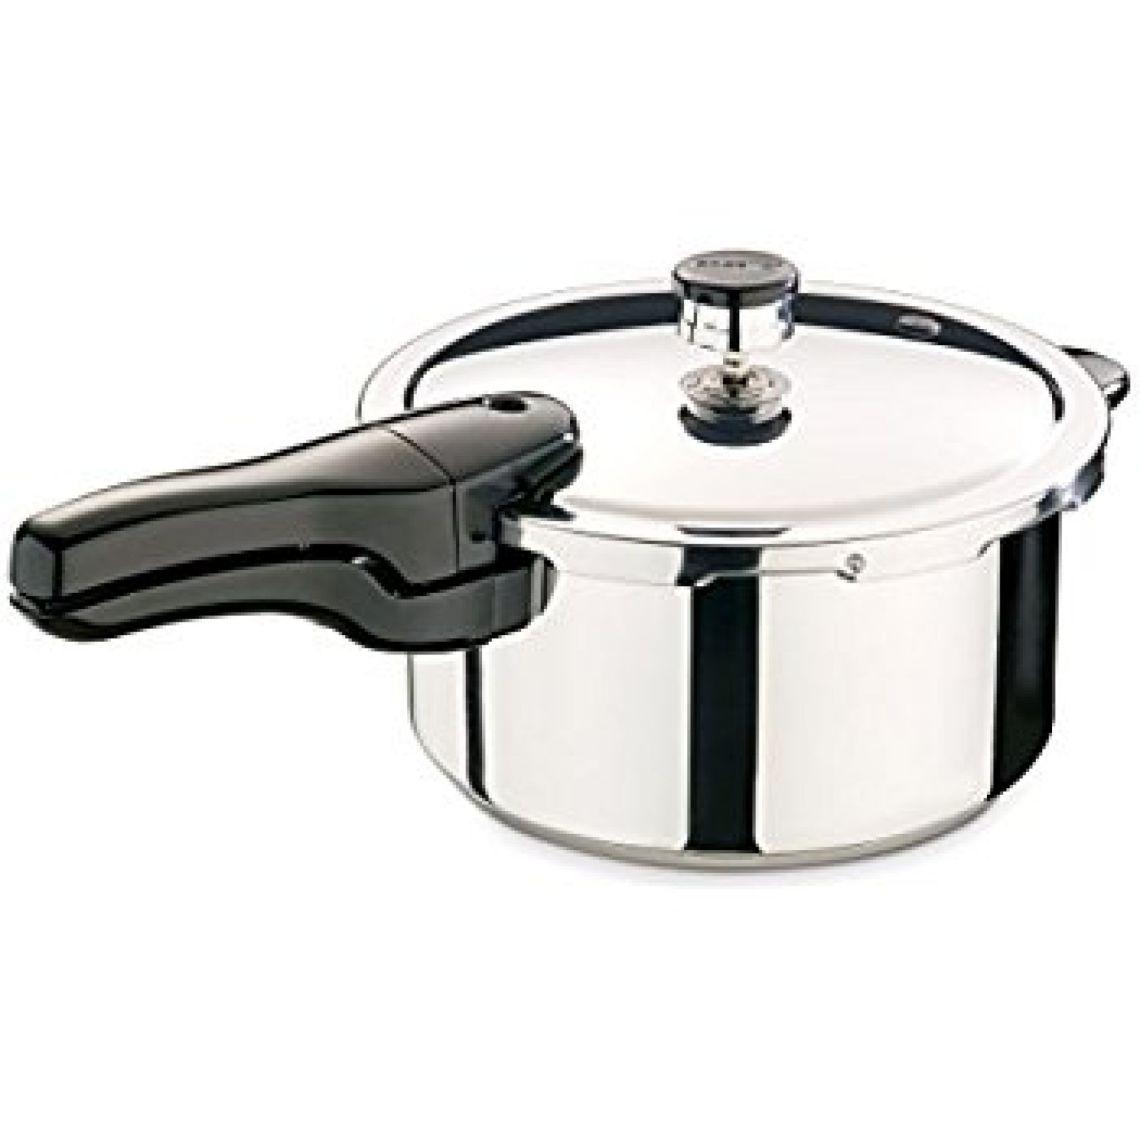 Amazon.com: Presto 01341 4-Quart Stainless Steel Pressure Cooker: Kitchen & Dining